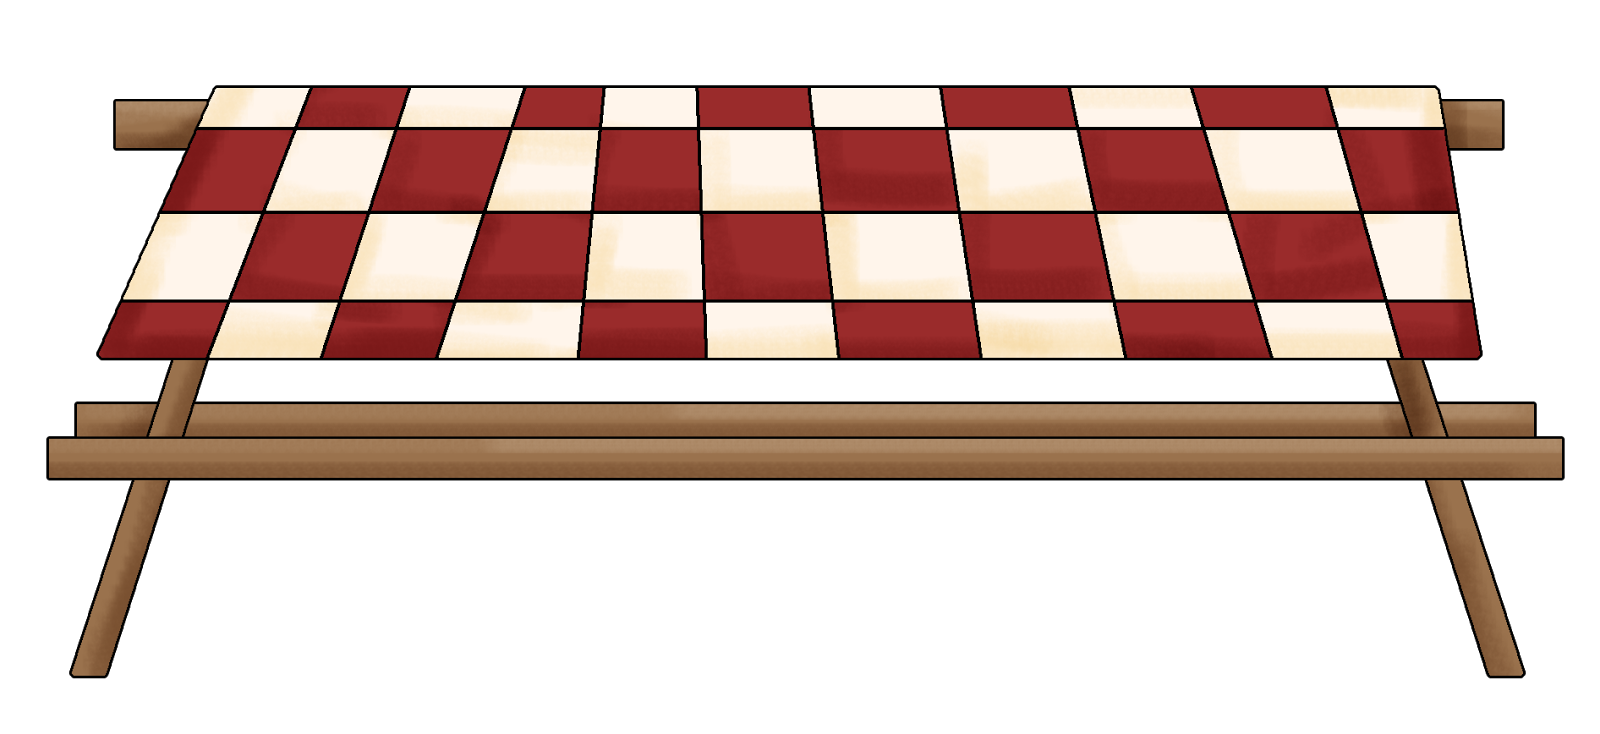 Bbq table cloth clipart free clip Picnic Tablecloth Clipart | Free download best Picnic Tablecloth ... clip